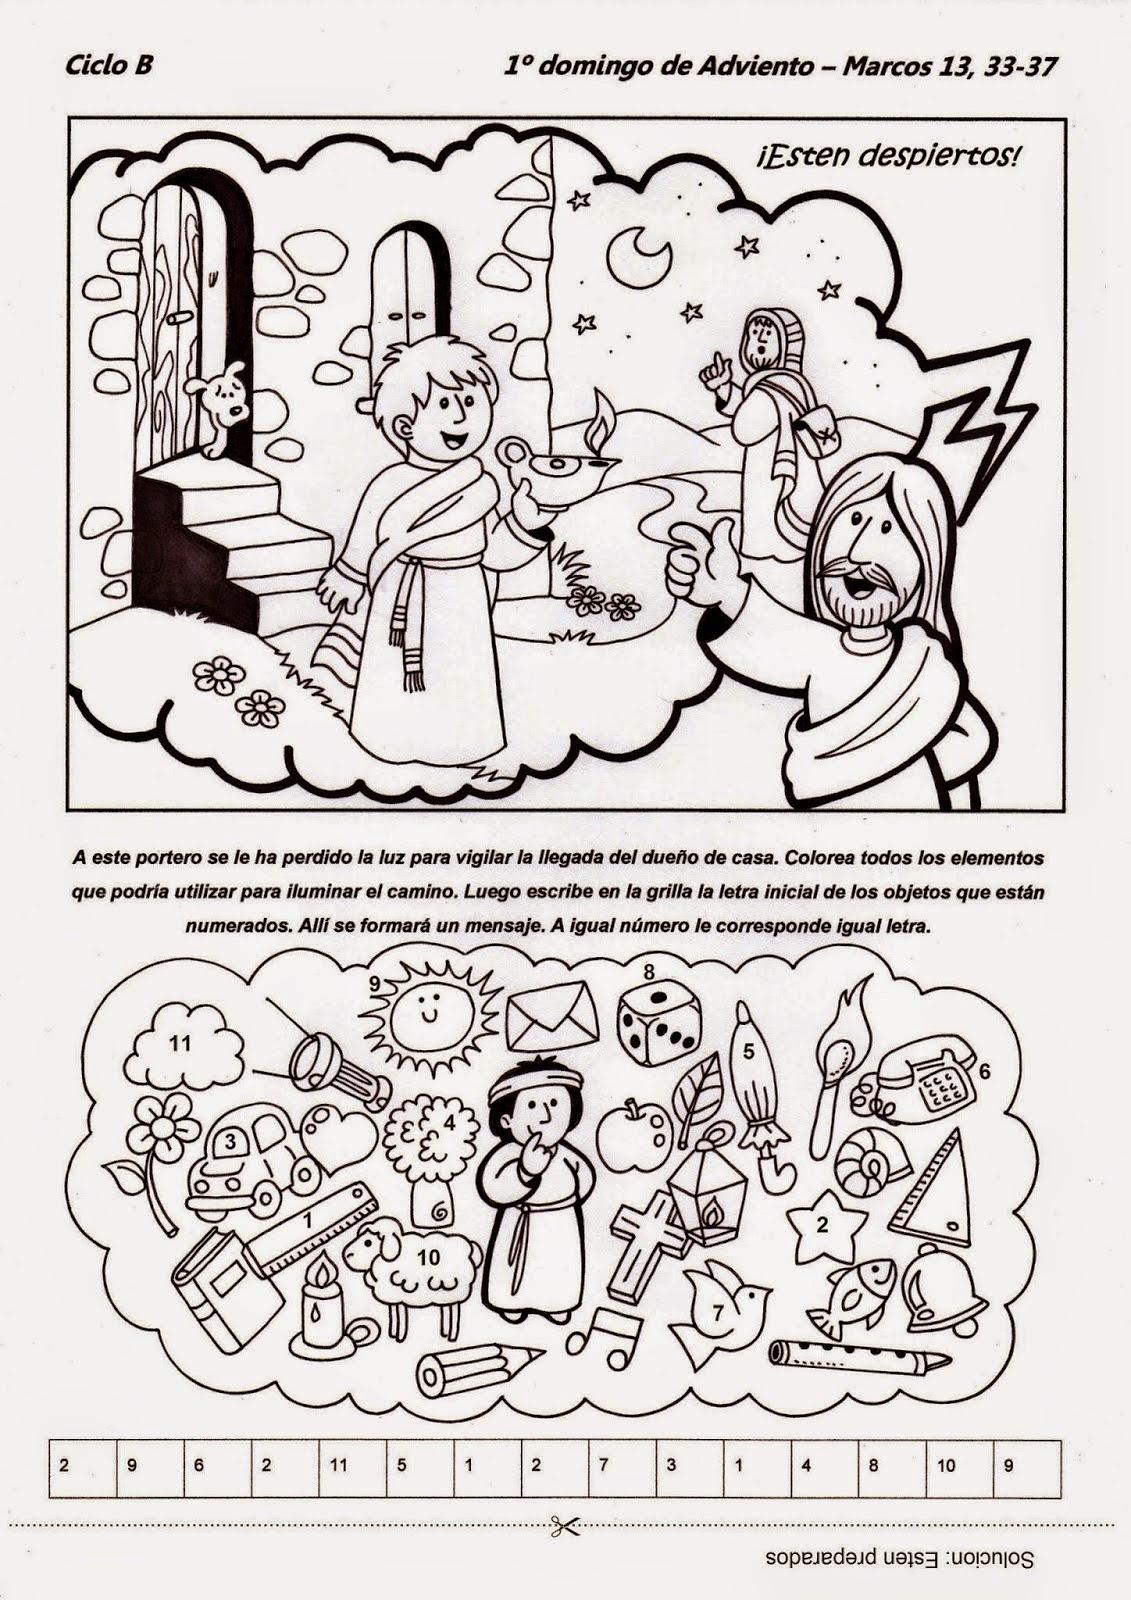 Educar con Jesús: Velad, despertad Mc 13,33-37 (ADB1-14)